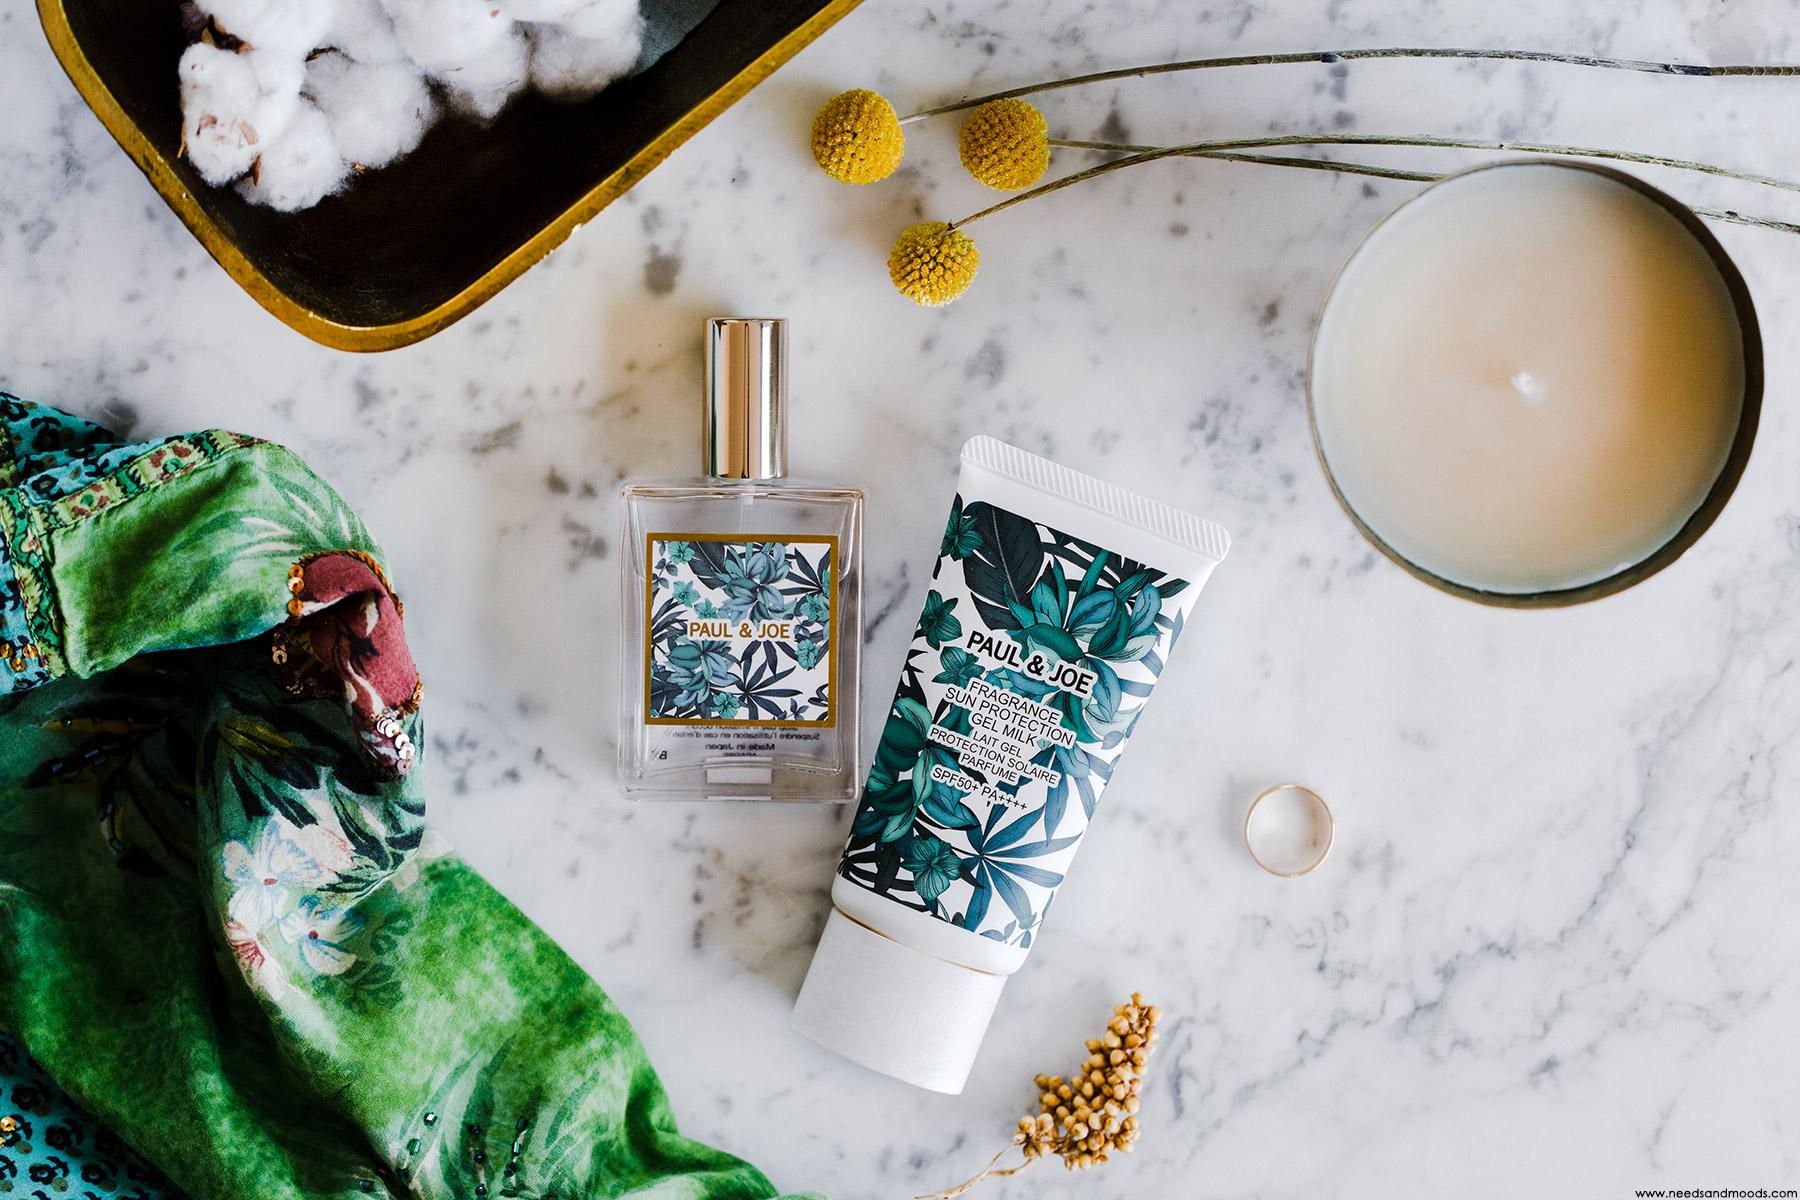 paul and joe brume parfumee avis